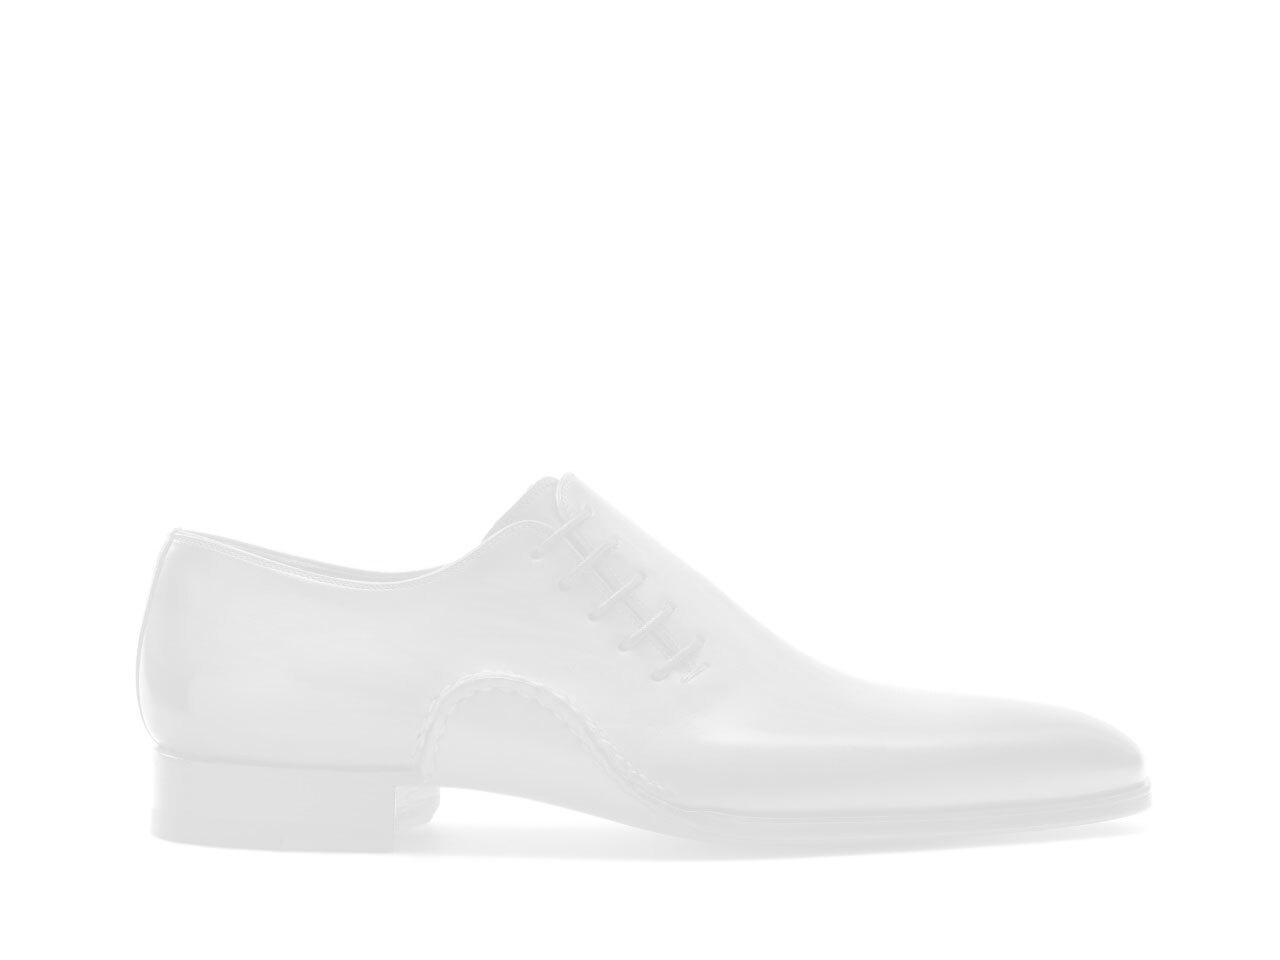 Sole of the Magnanni Stelvio Navy Men's Single Monk Strap Shoes